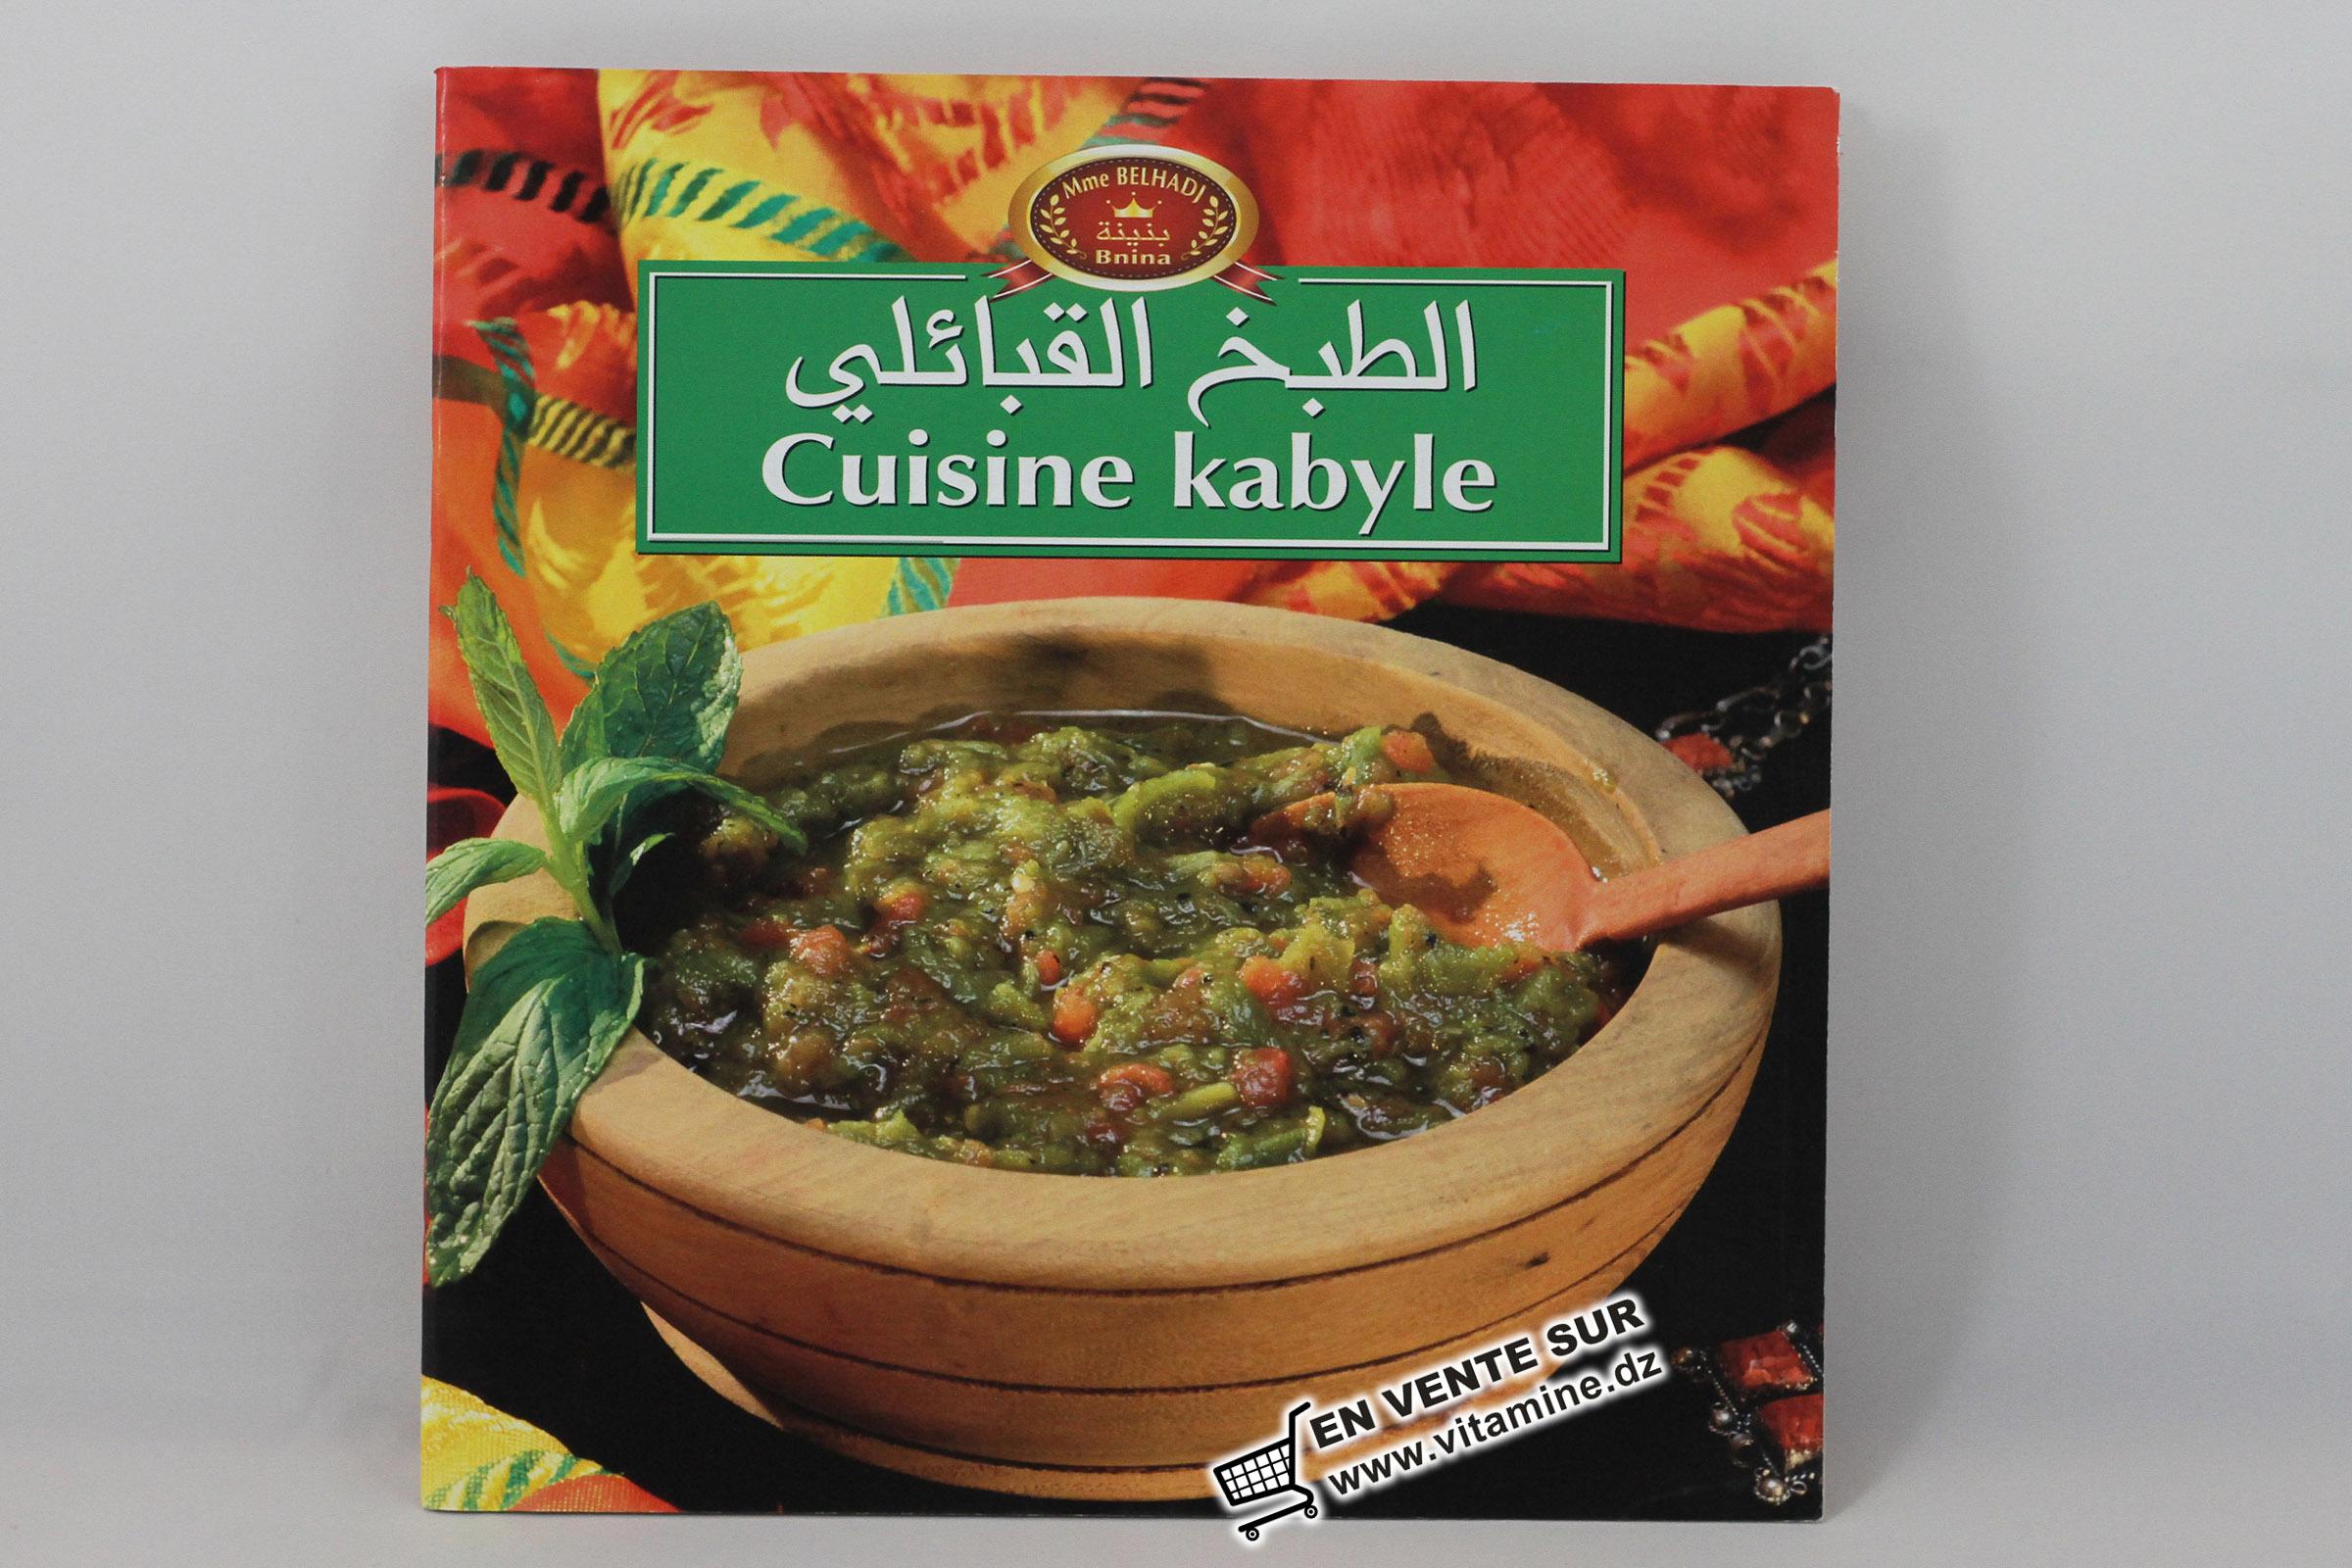 Bnina - Cuisine kabyle